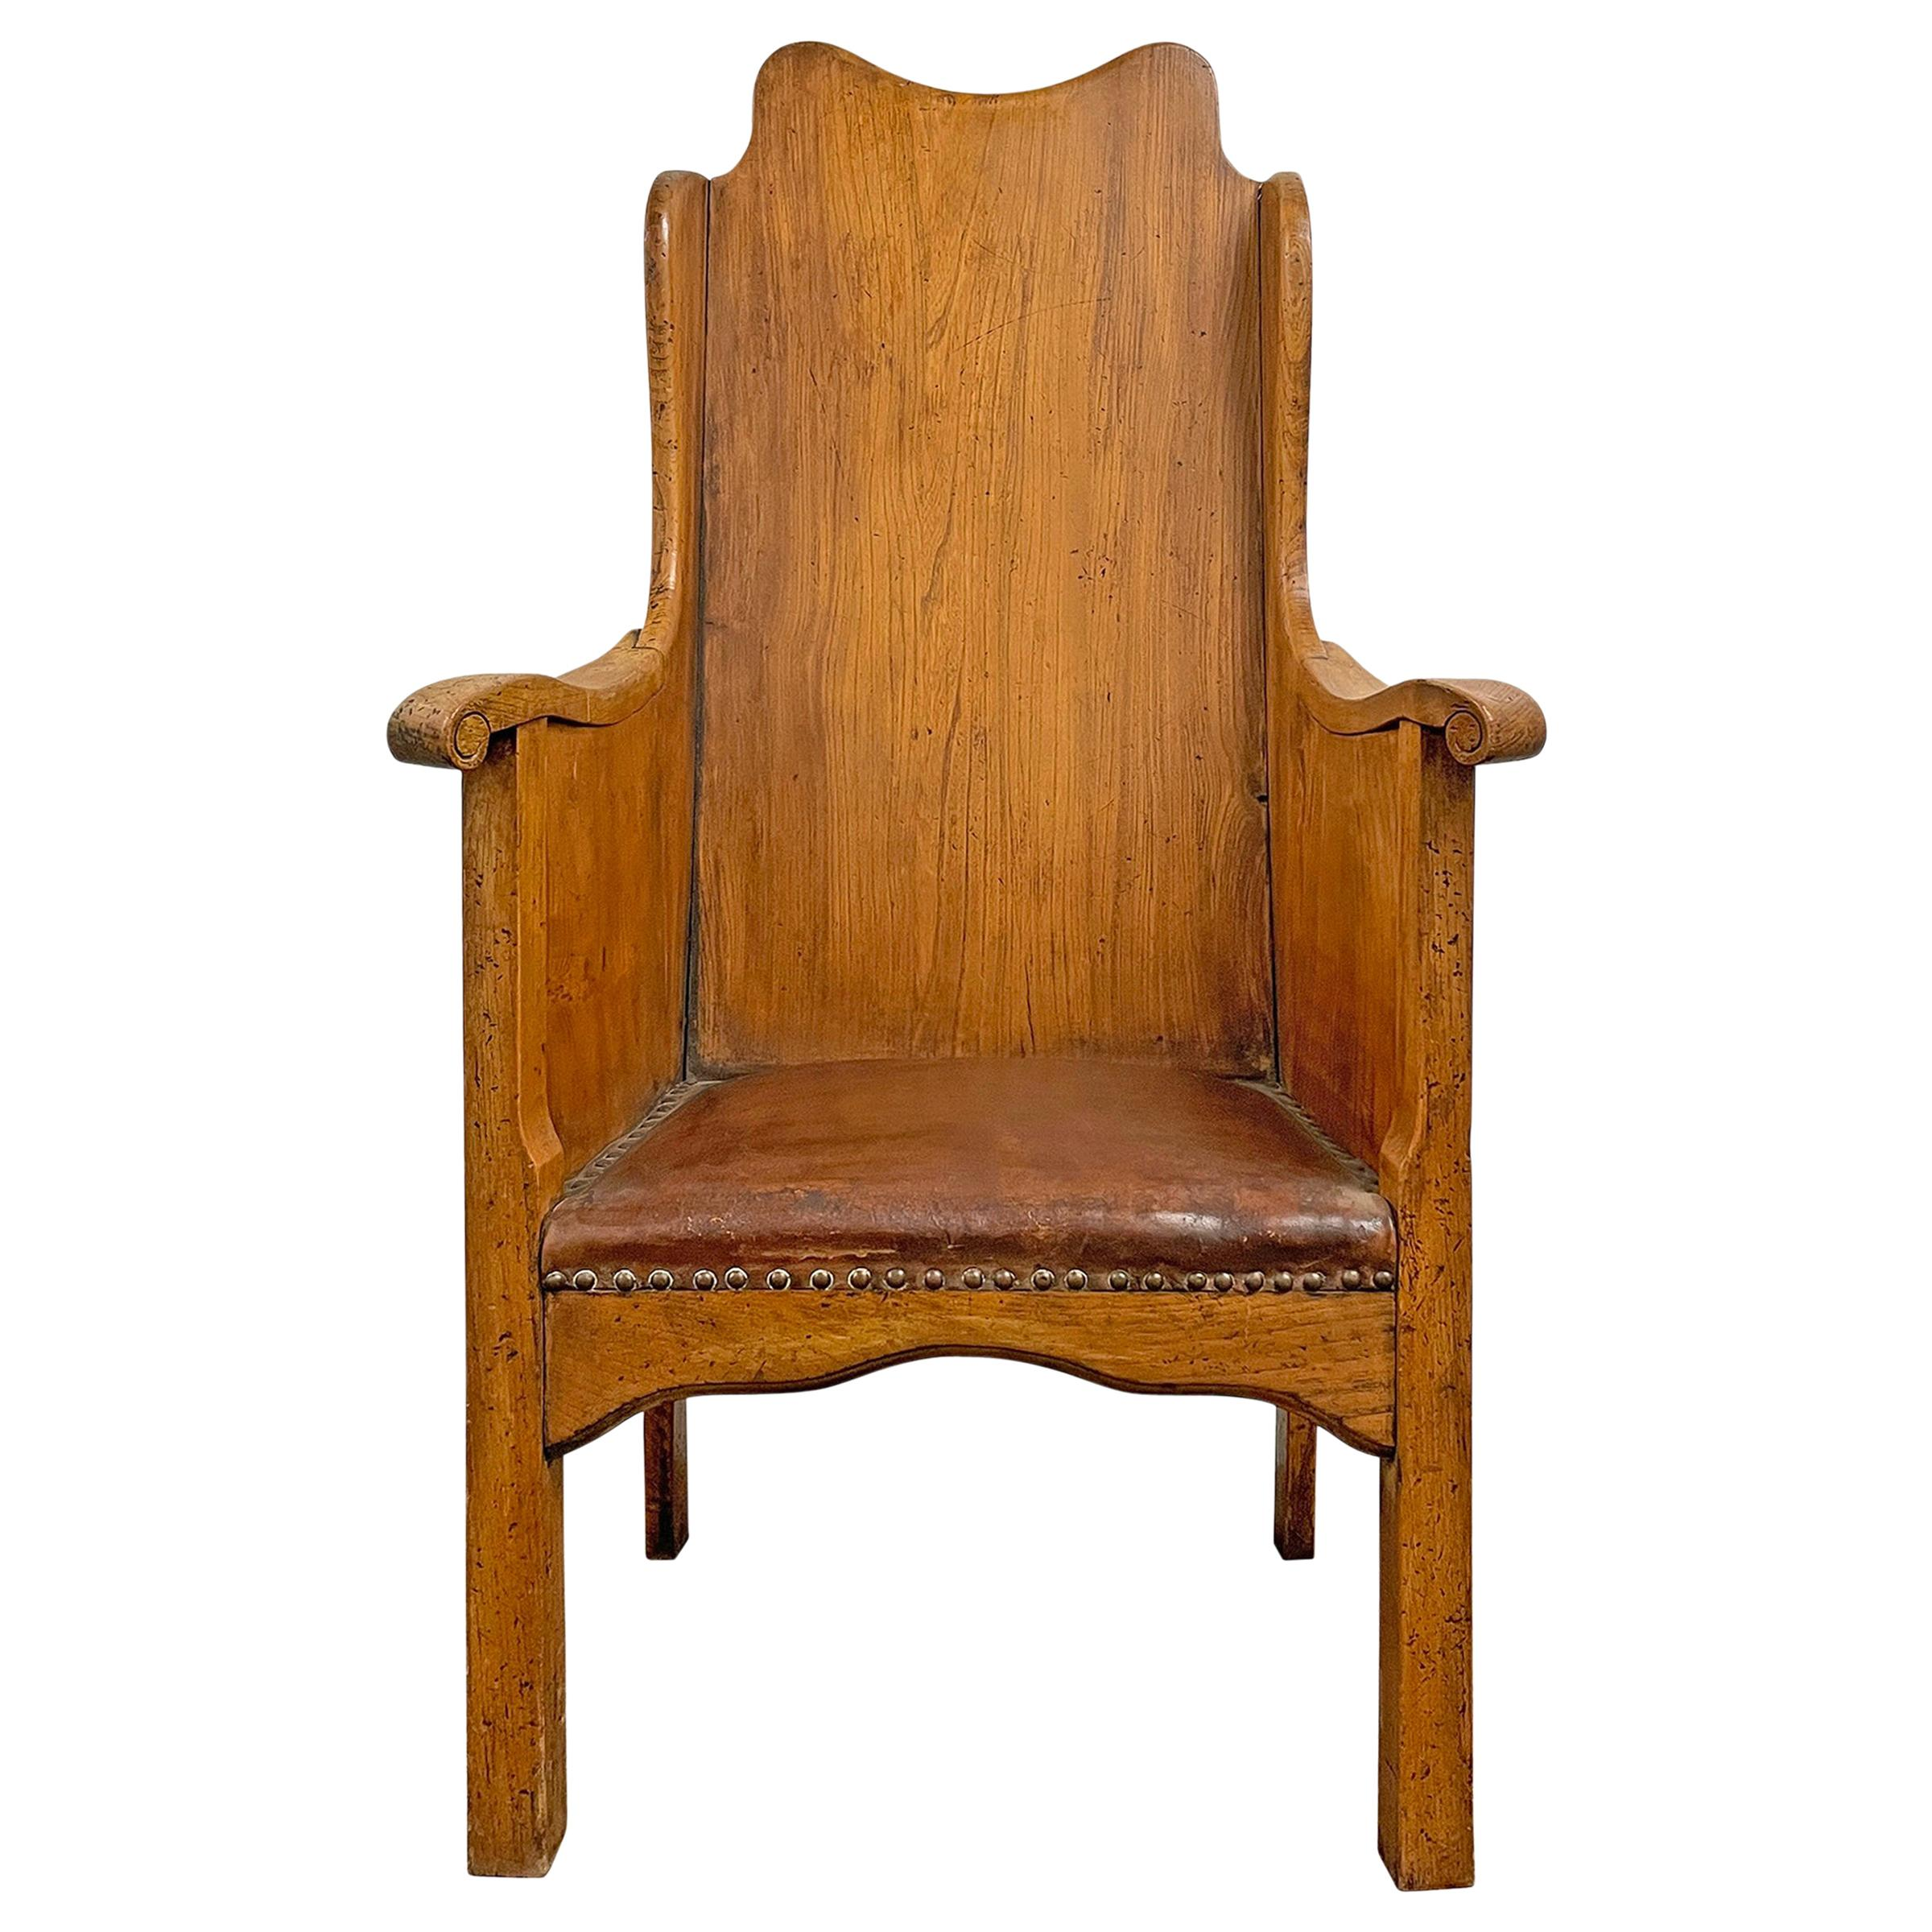 English Arts & Crafts Hall Chair